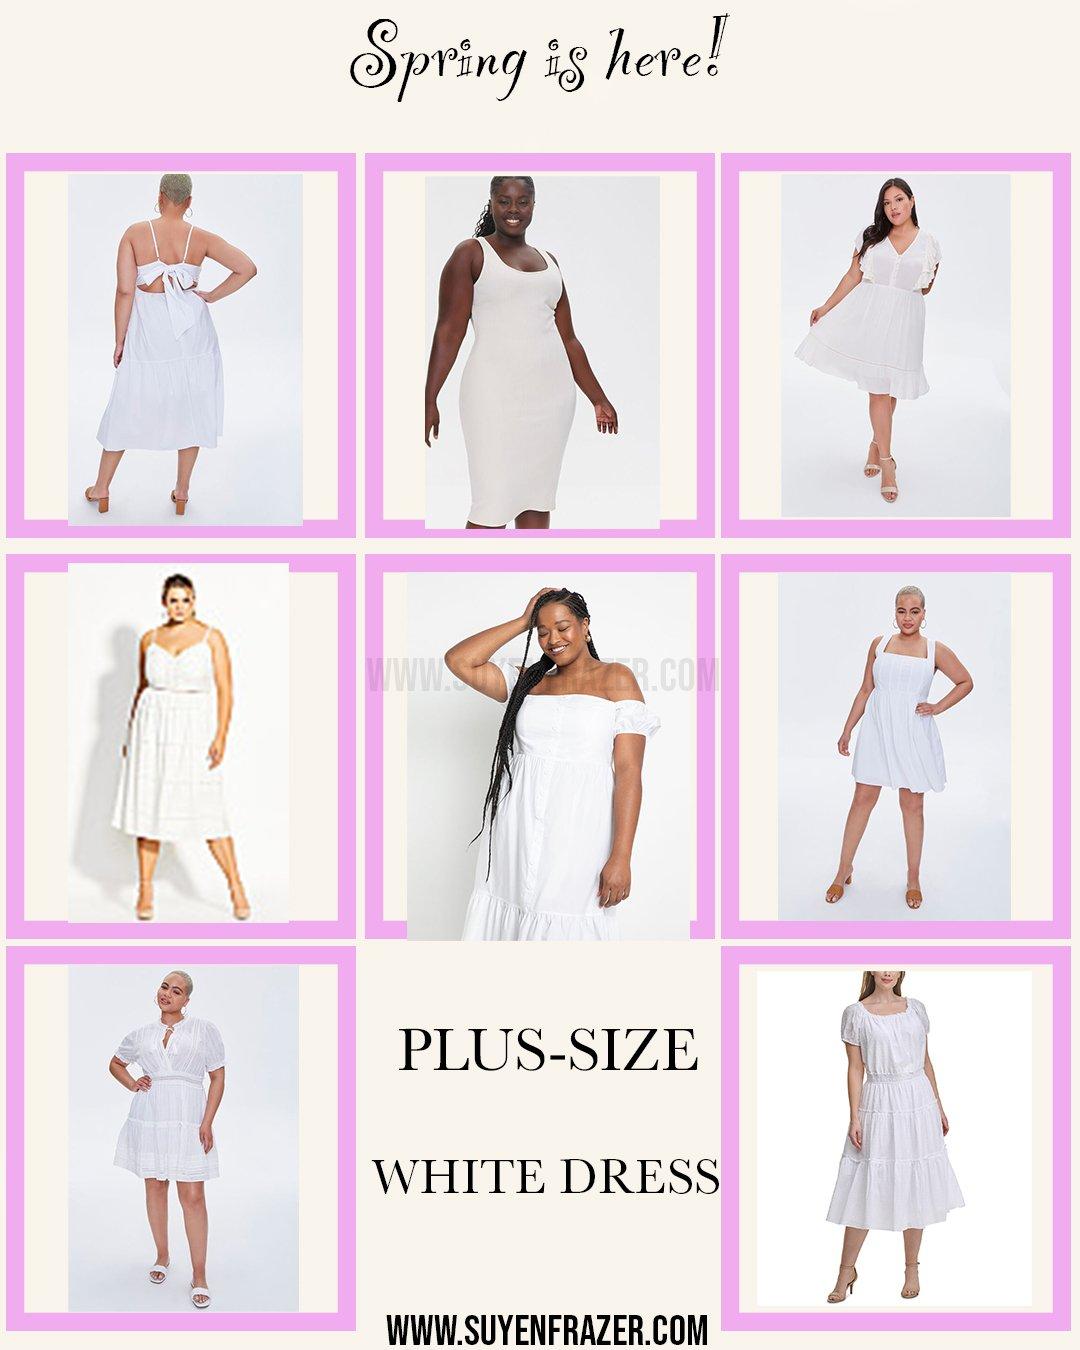 Plus Size White Dresses For Spring & Summer 2021